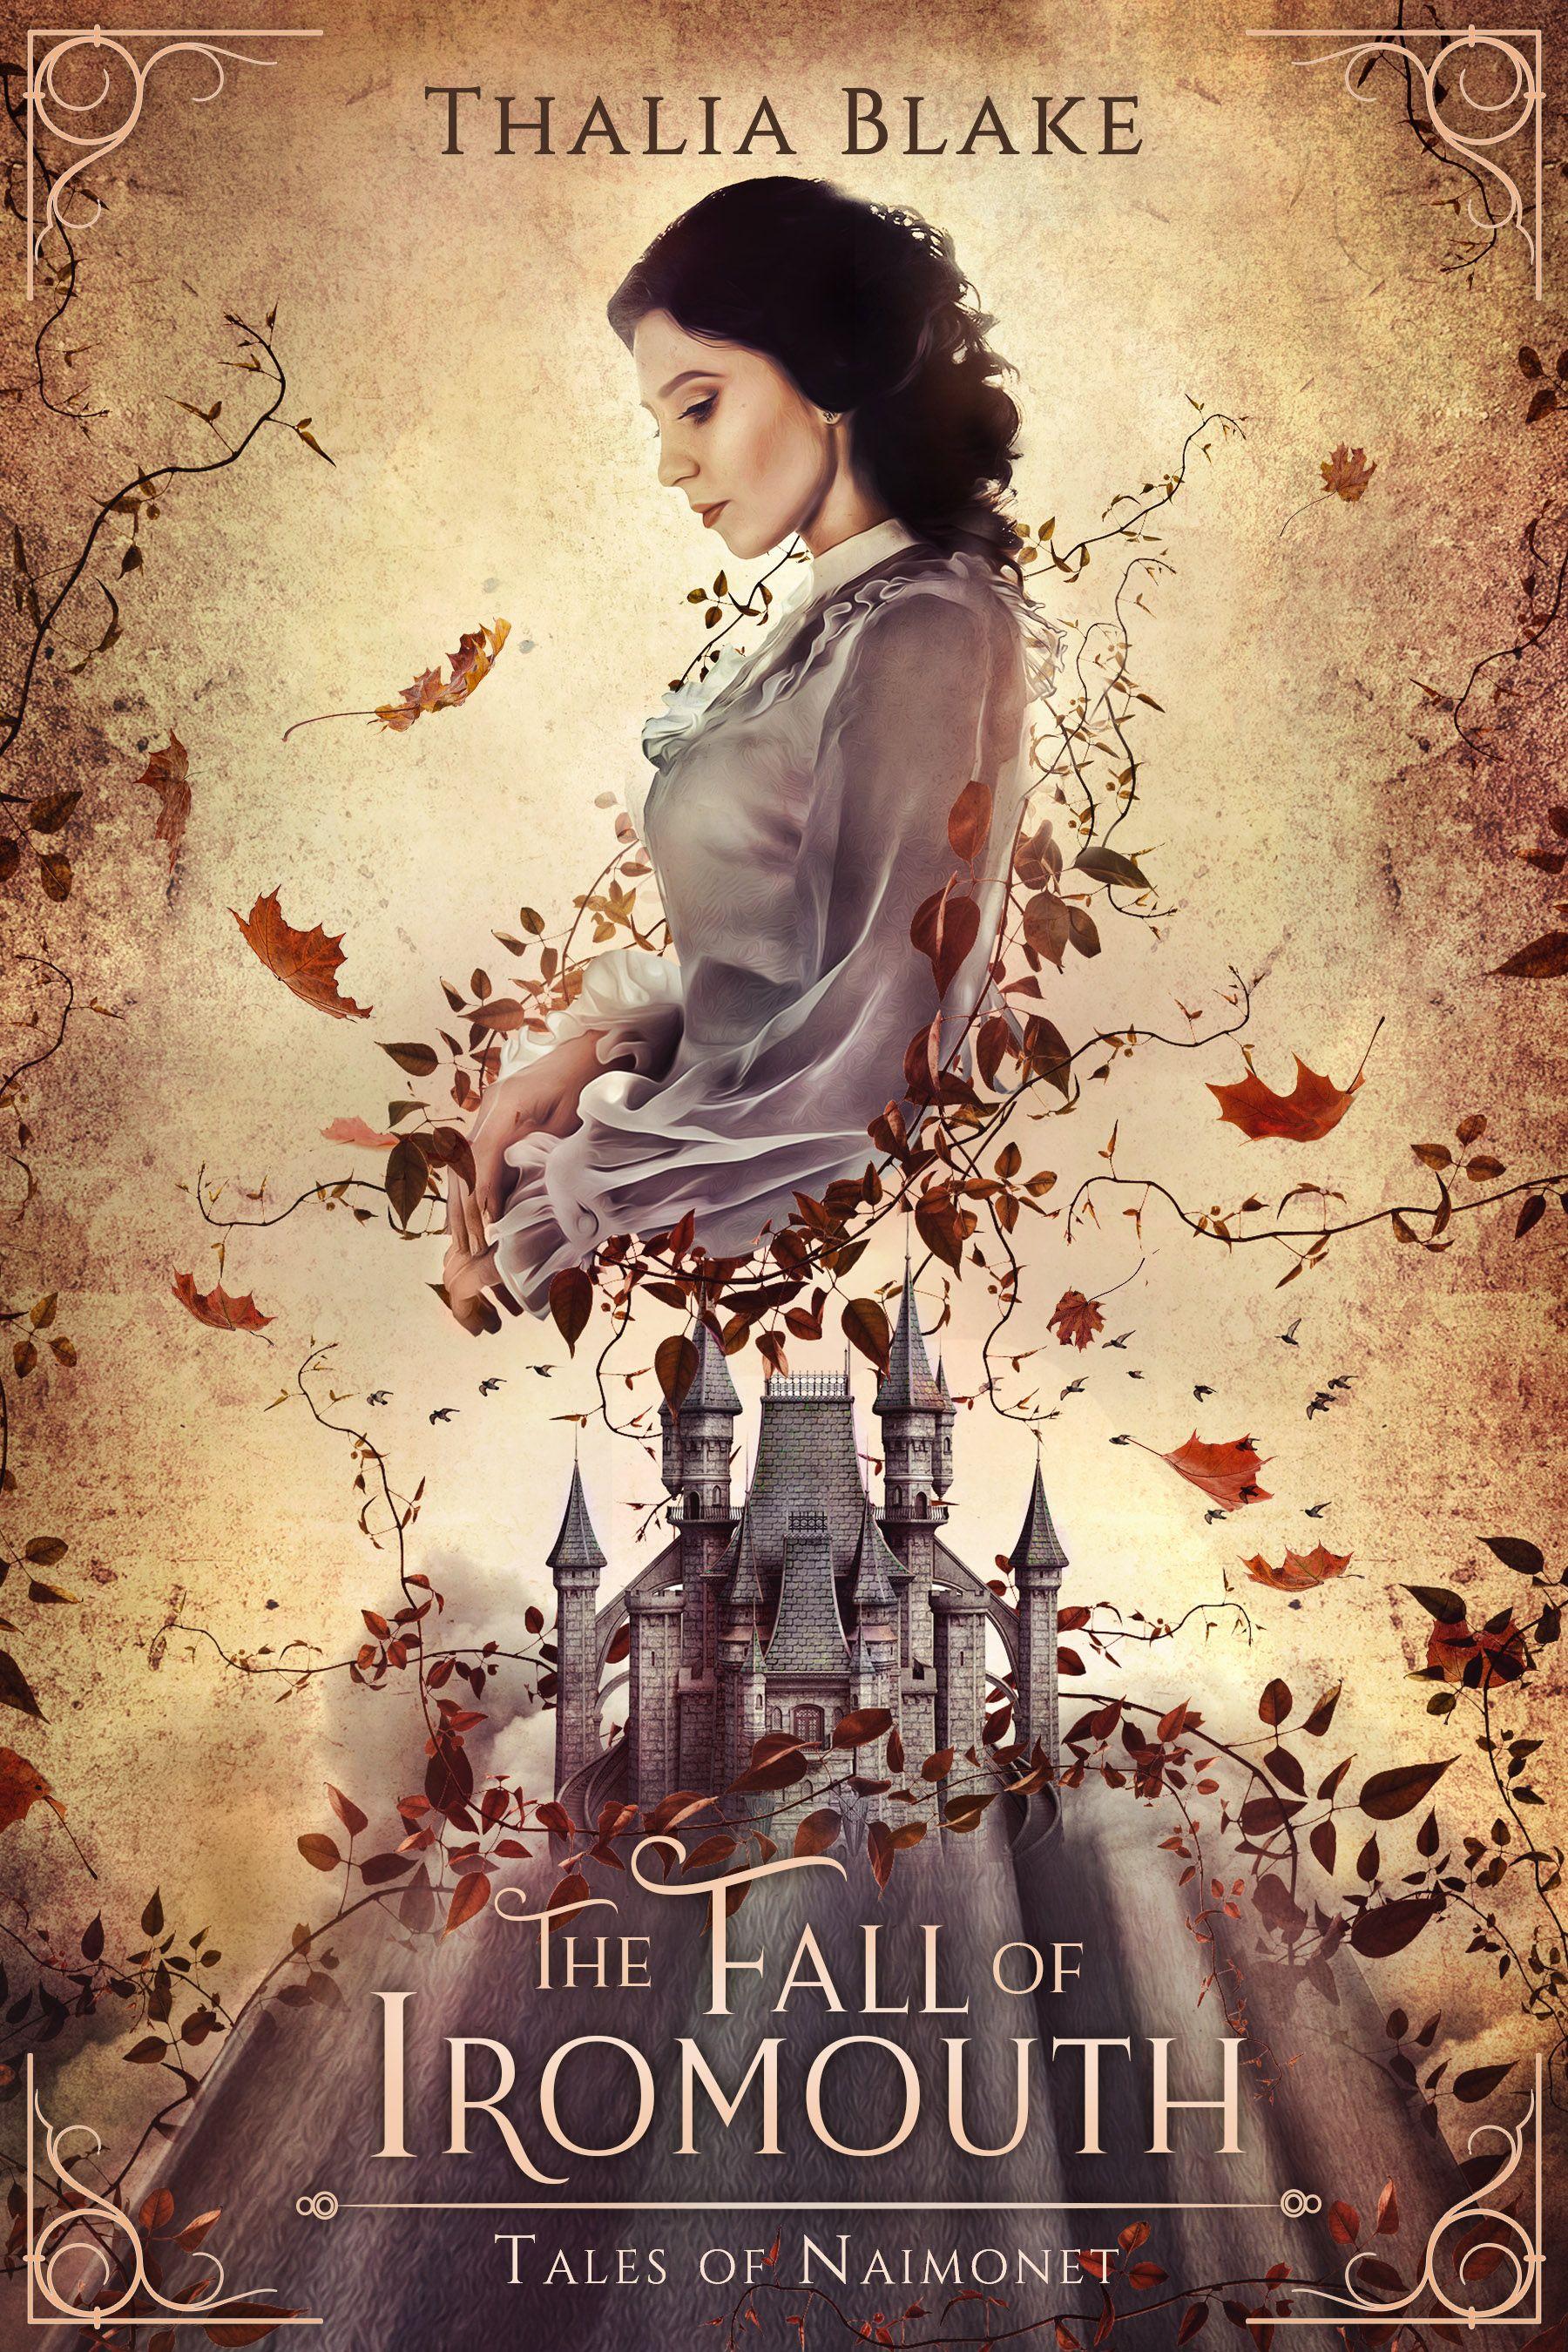 Fantasy Book Cover Design By Moorbooks Design Book Cover Design Inspiration Wattpad Book Covers Book Cover Design